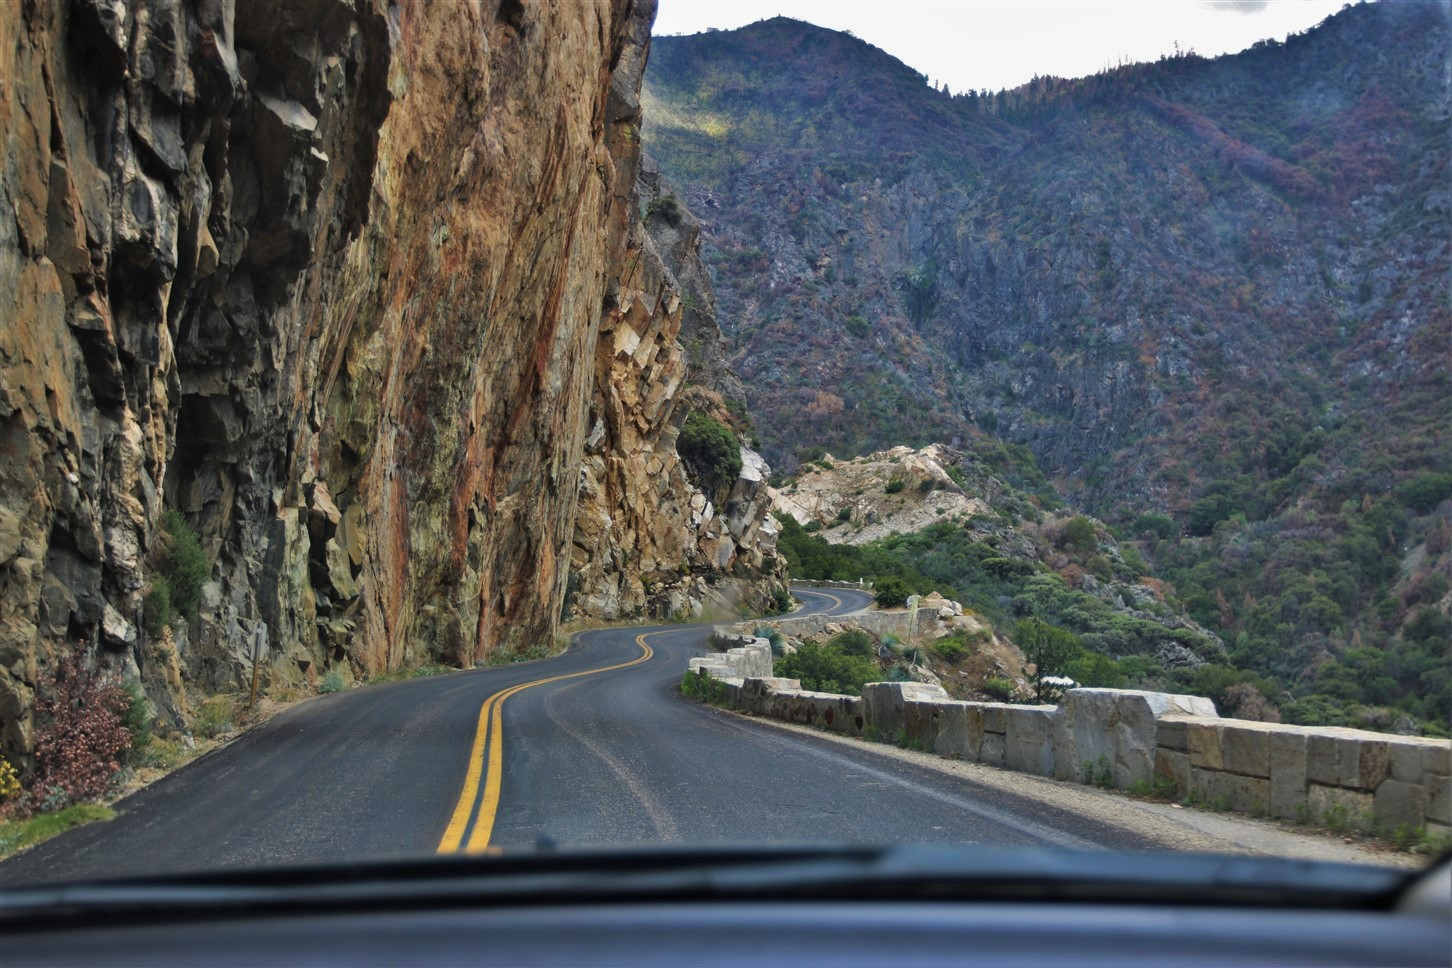 2016 05 23 105 Sequoia Kings Canyon.jpg